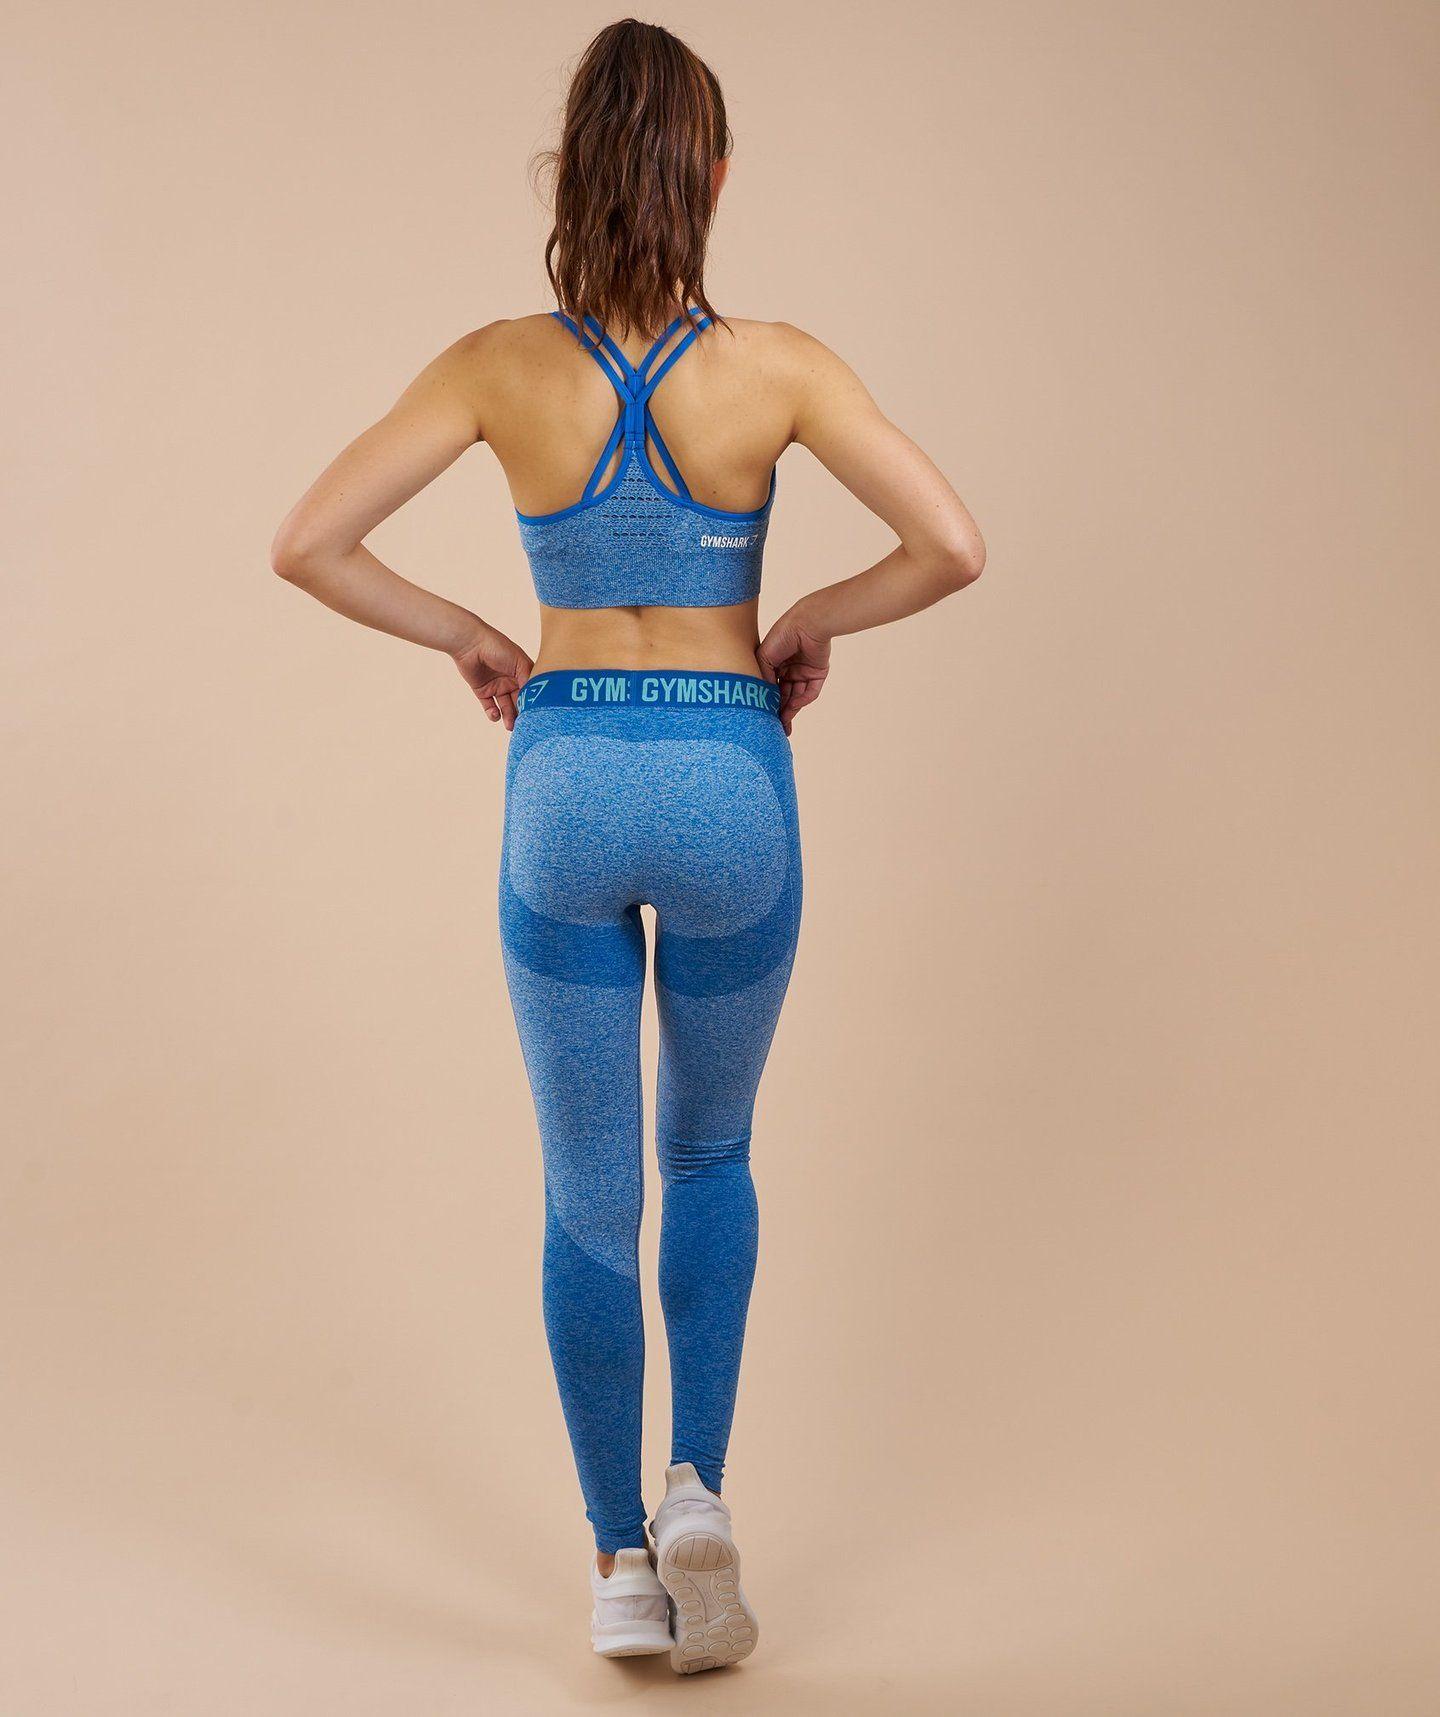 e95535832056e7 Gymshark Flex Leggings - Blueberry Marl/Marine Blue 1 | Clothes ...